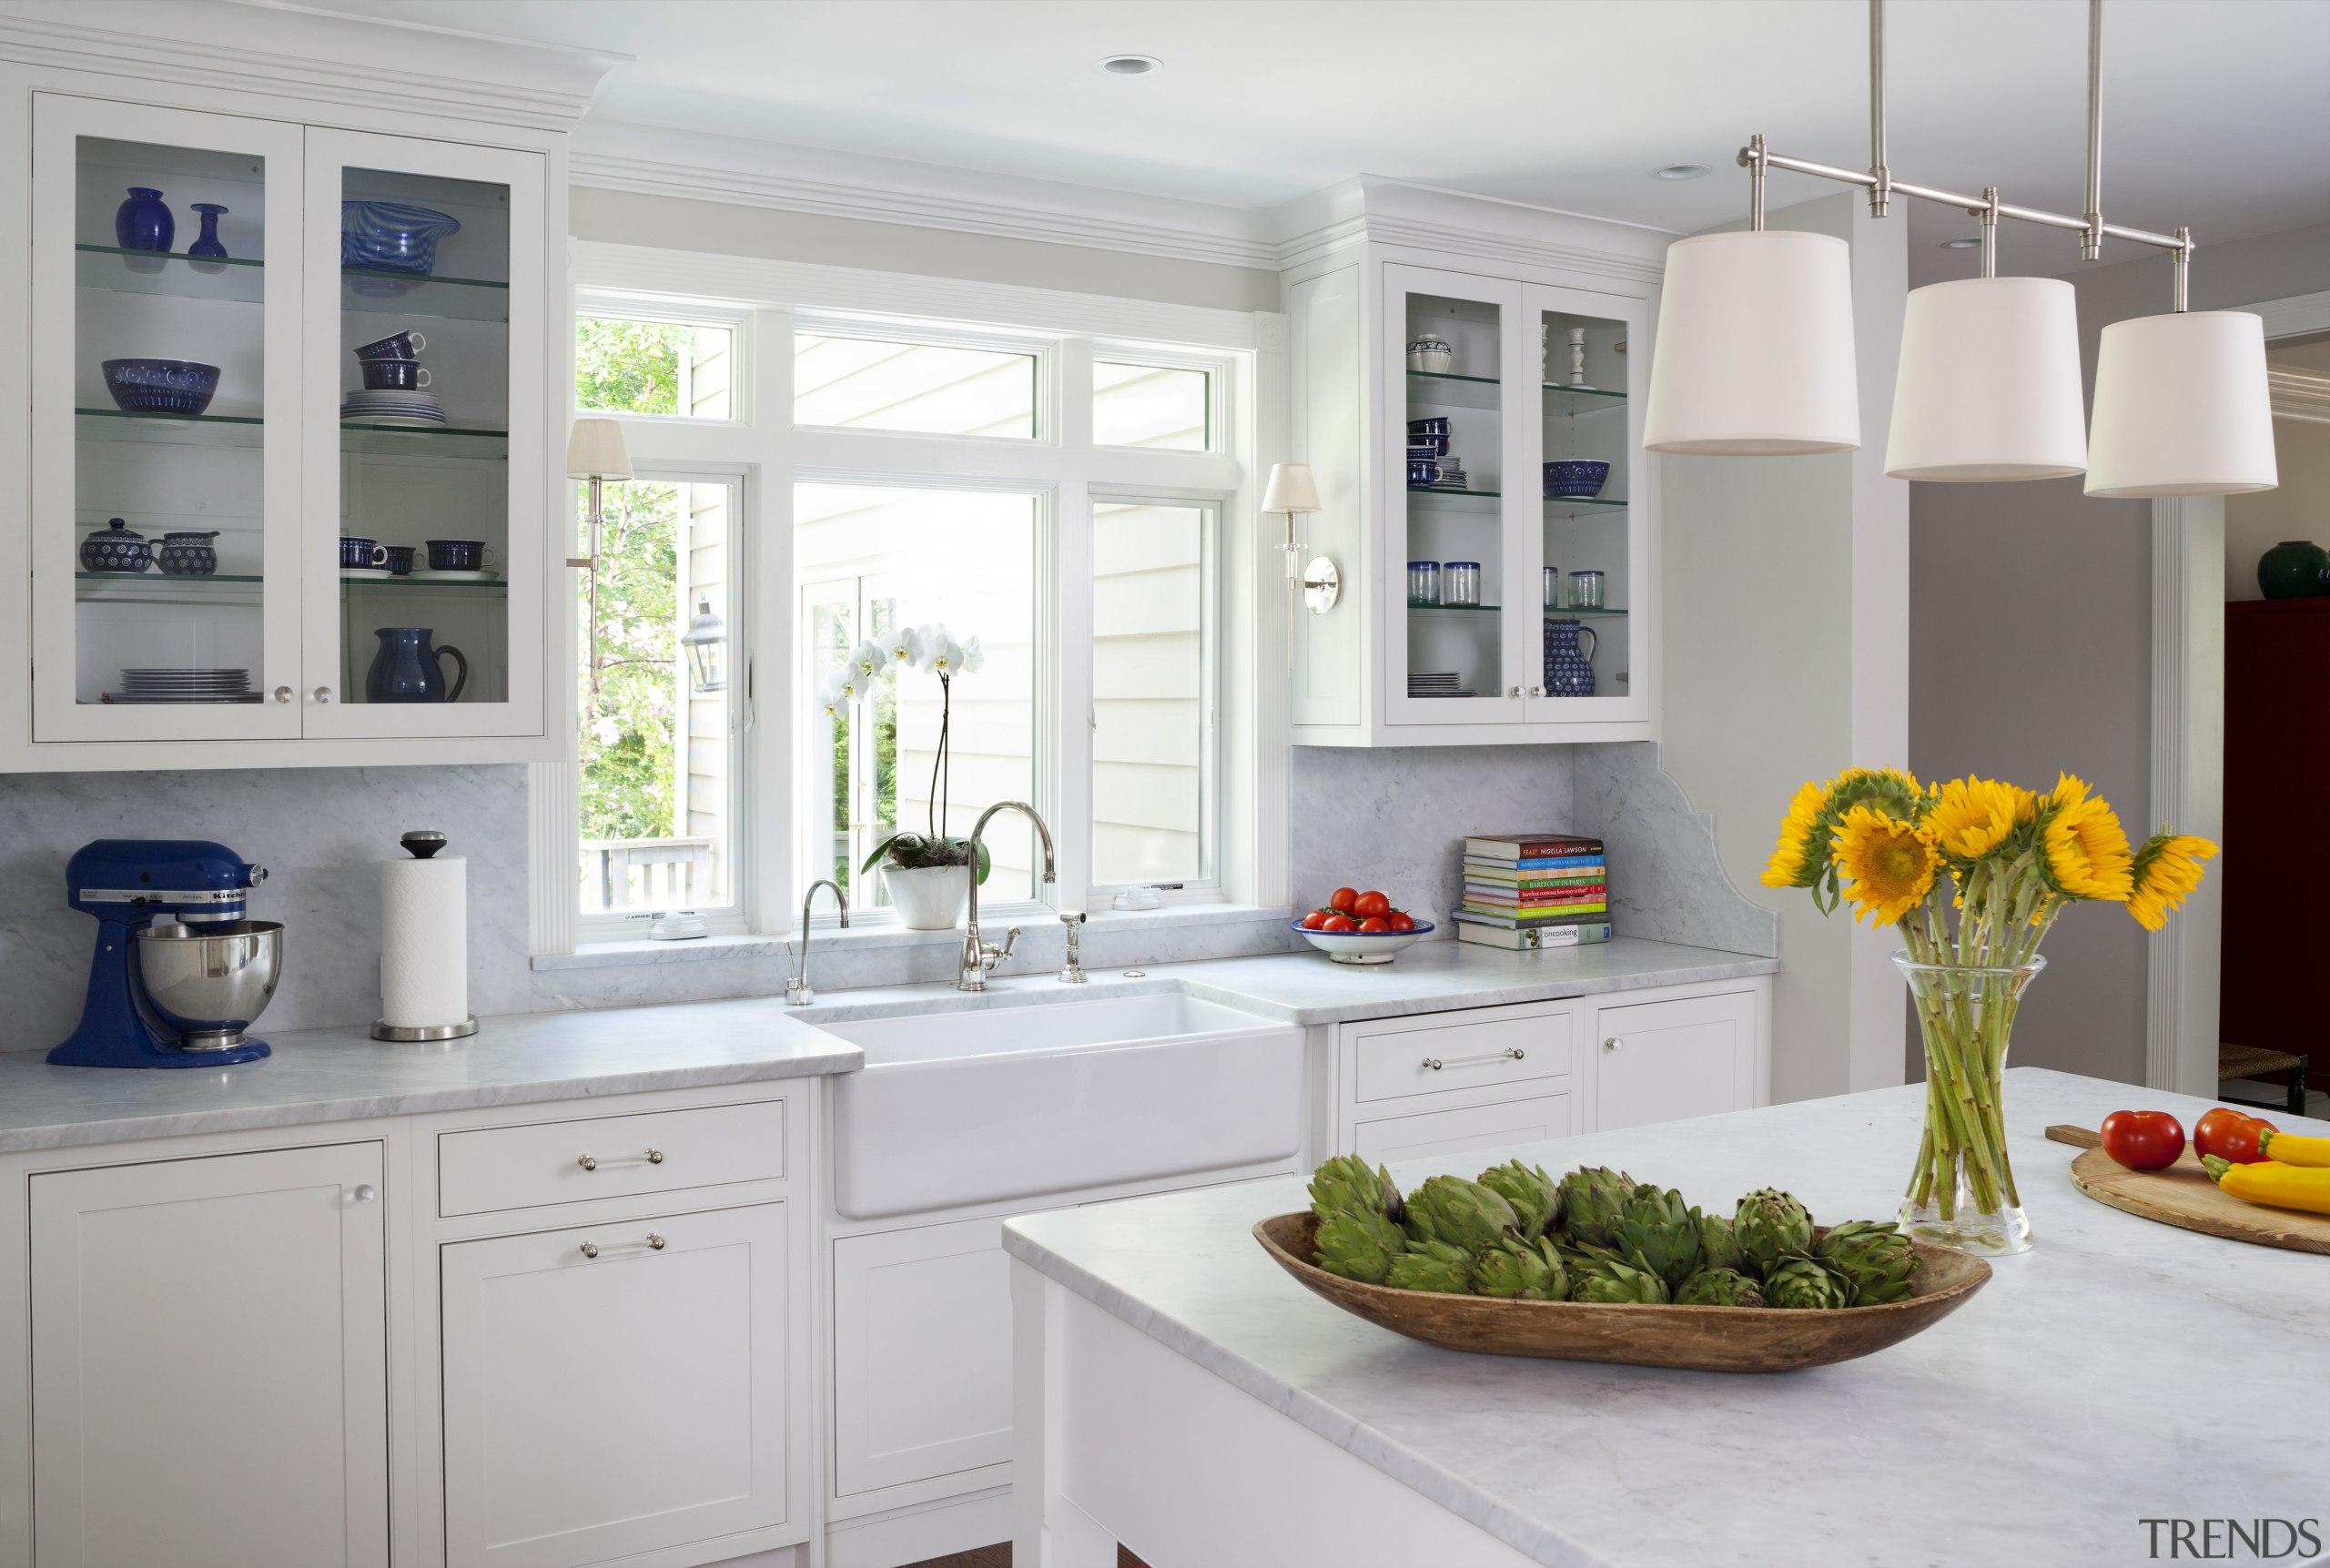 For this kitchen, designer Jan Goldman, of Kitchen cabinetry, countertop, cuisine classique, home appliance, interior design, kitchen, room, window, gray